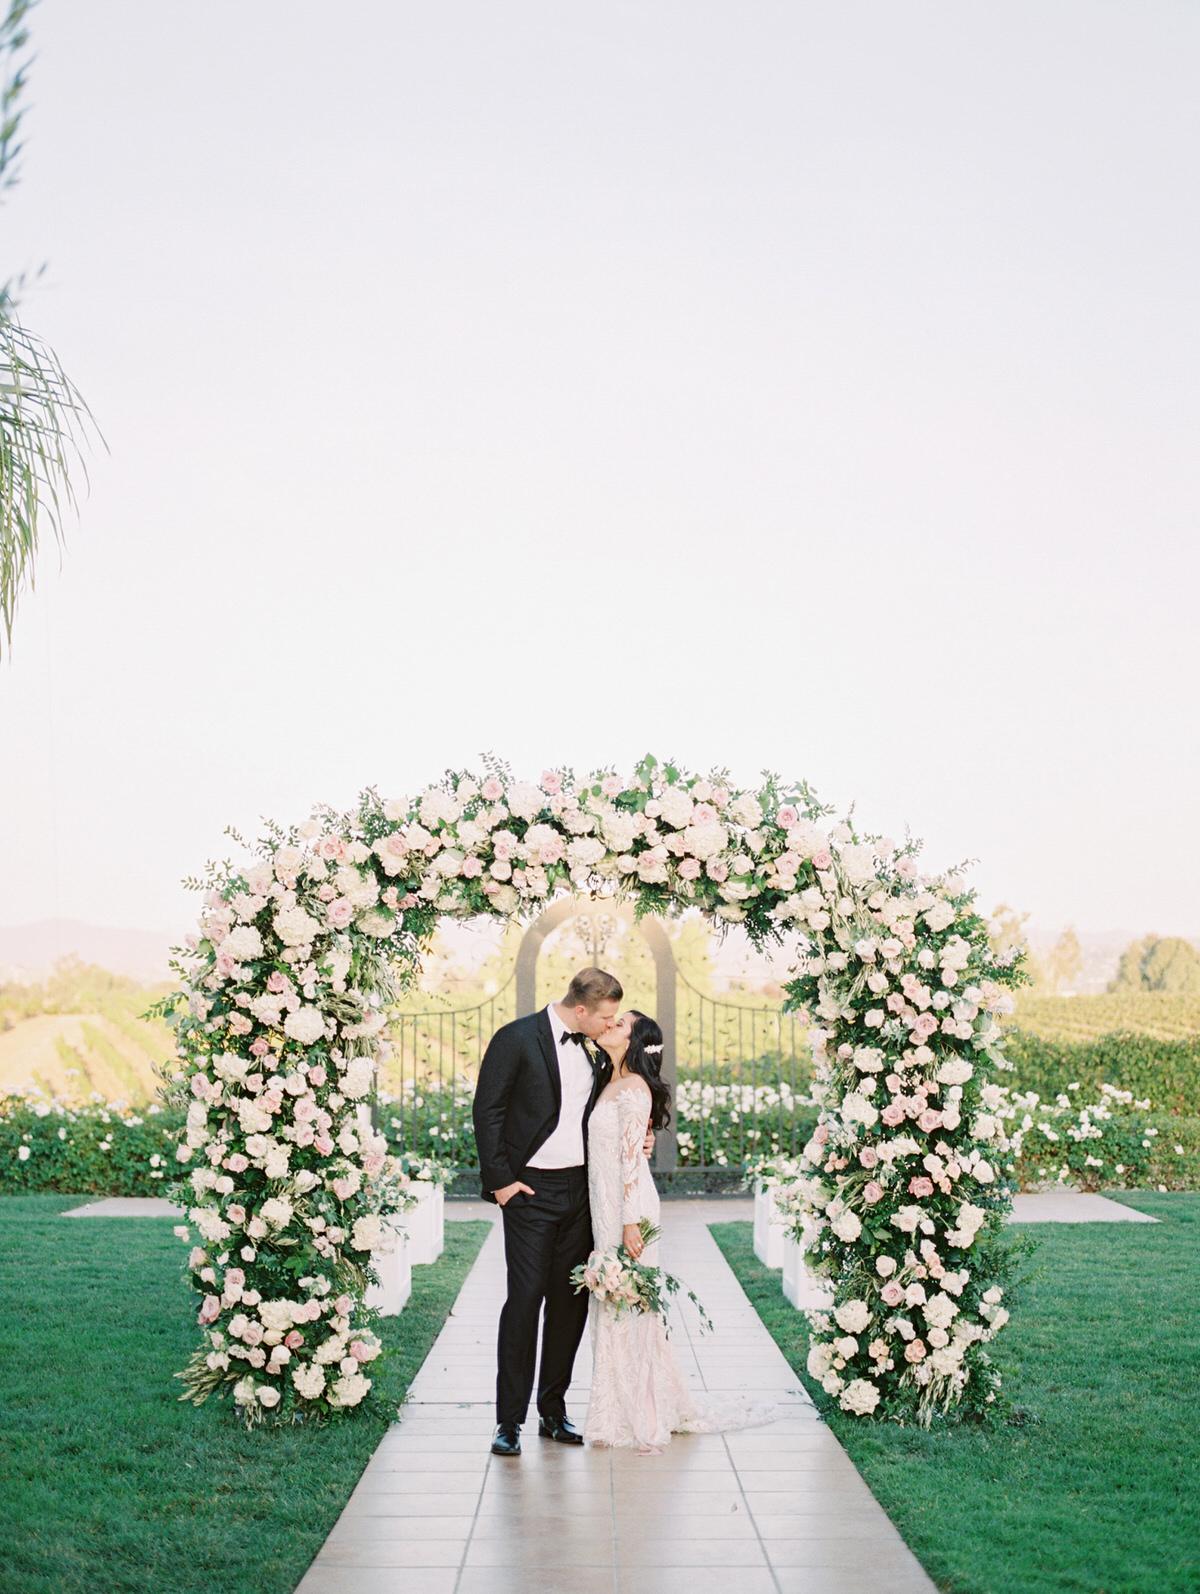 Villa De Amore Weddings Temecula California